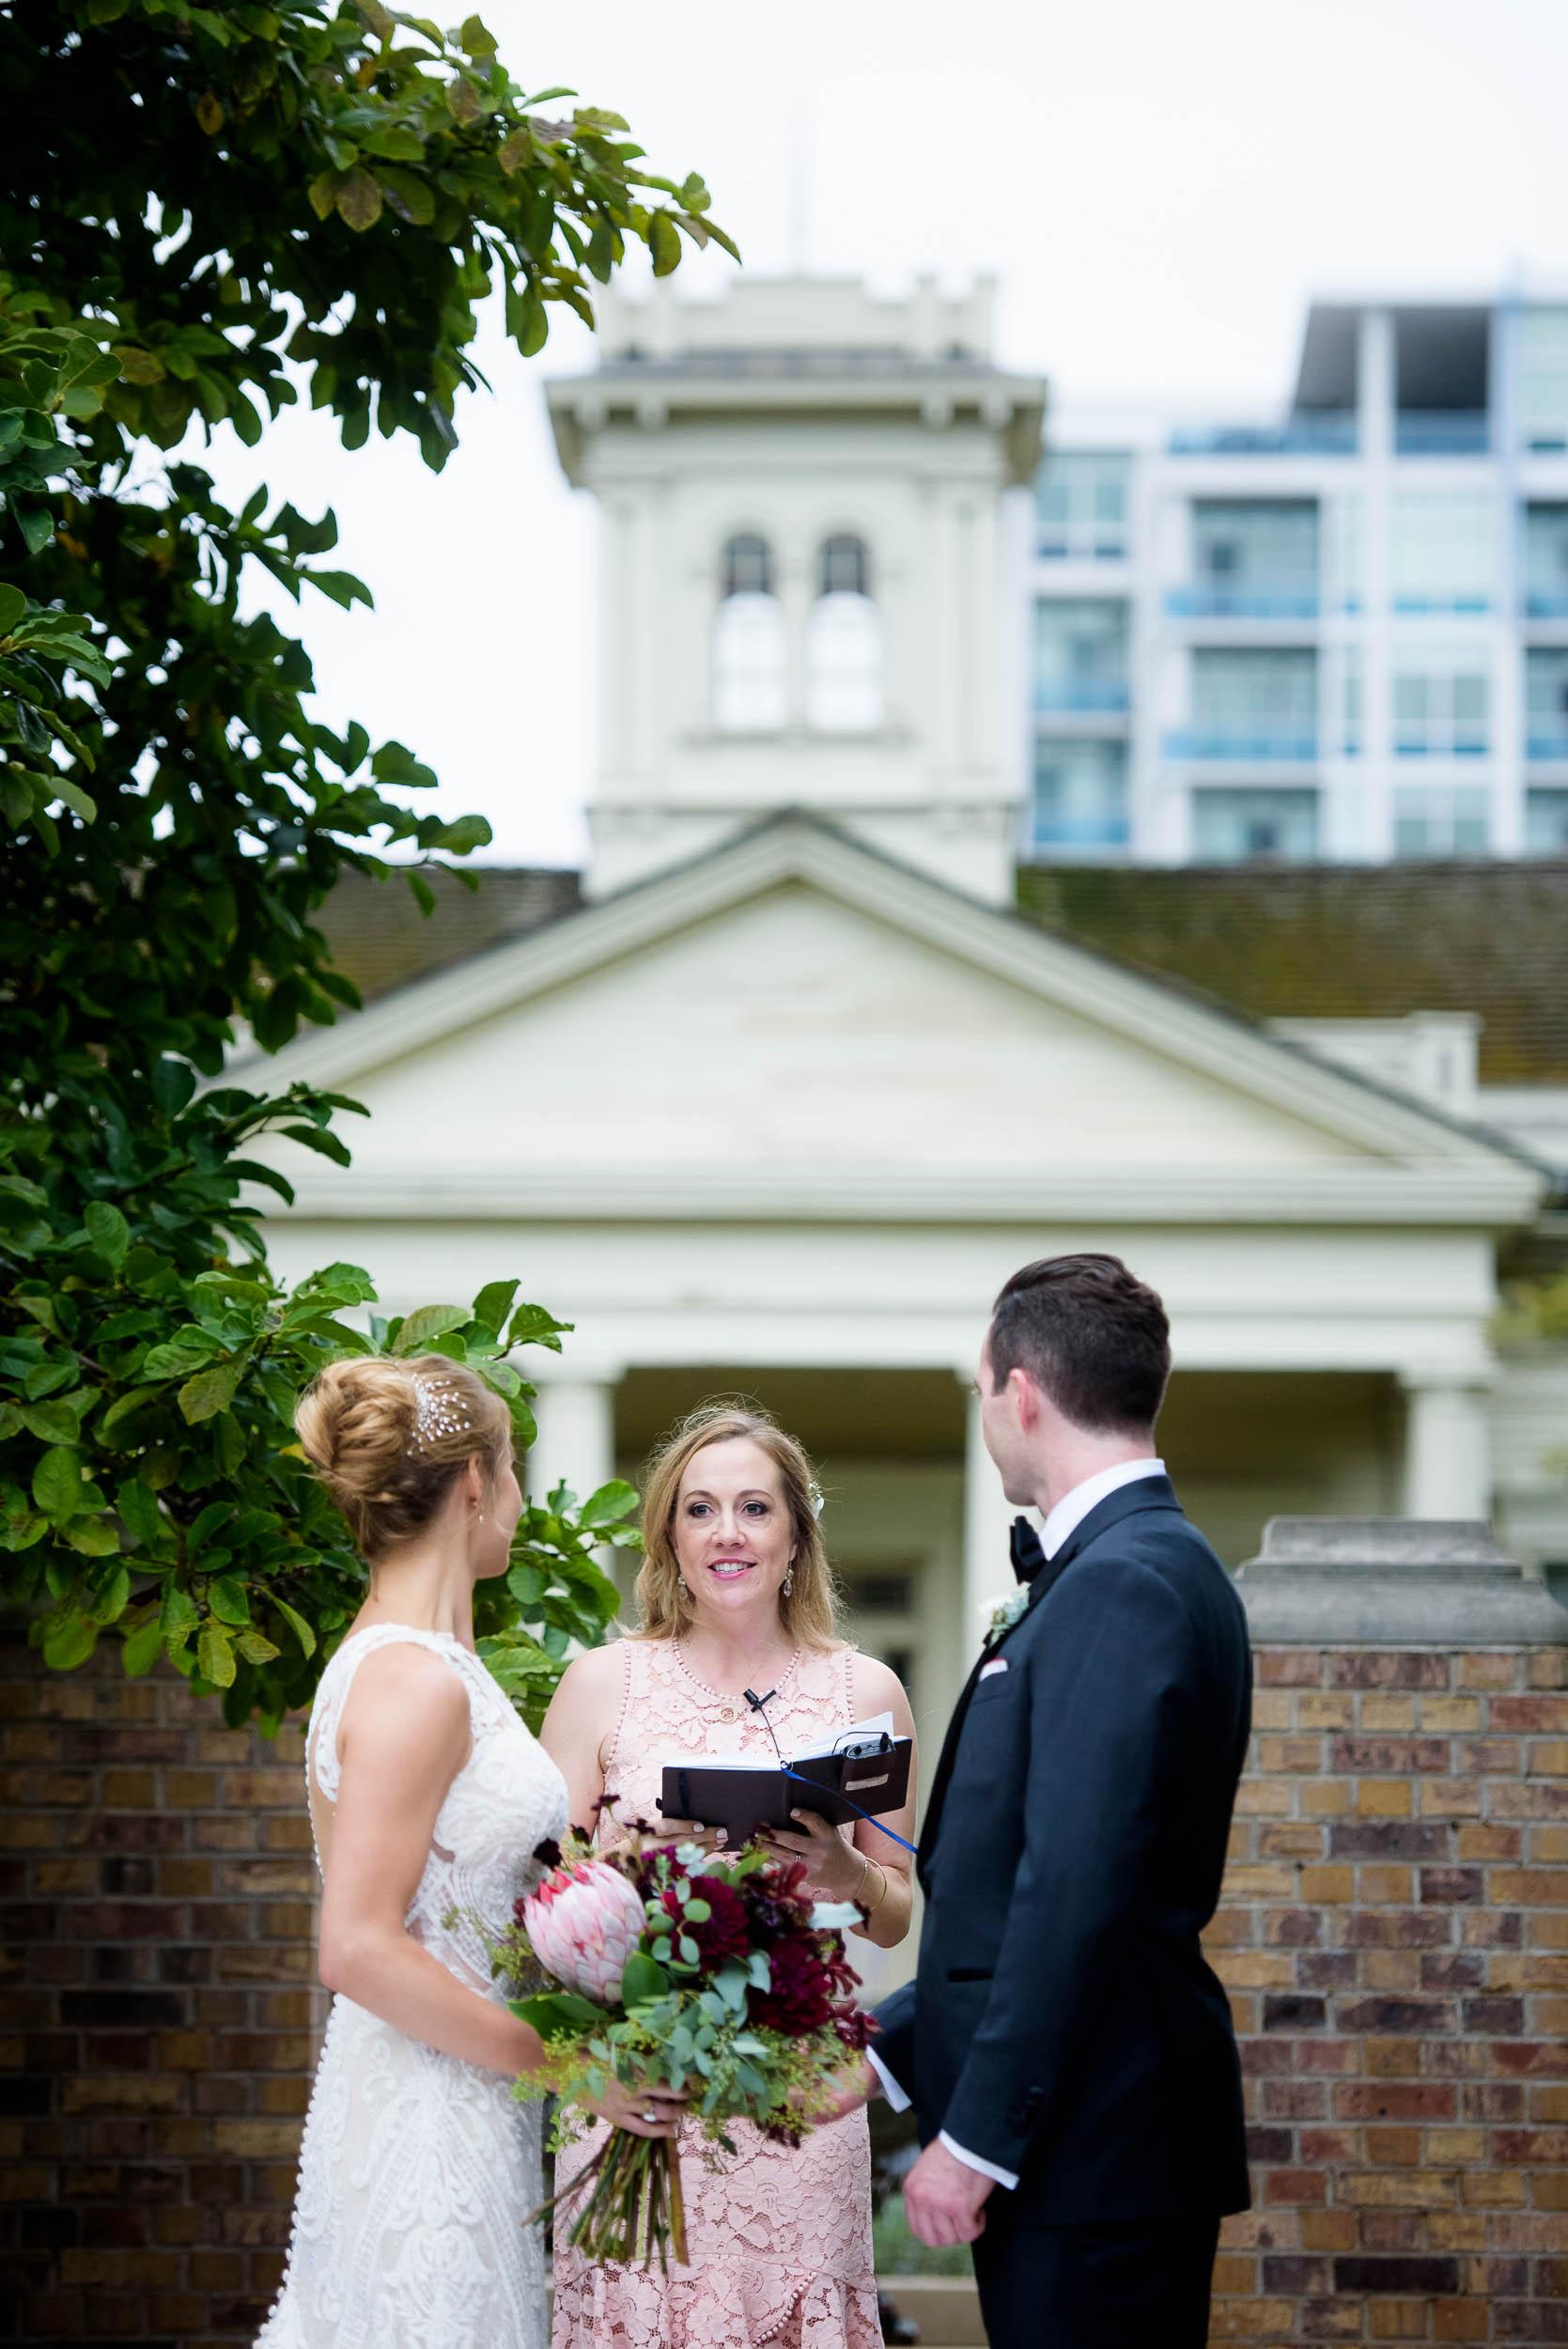 Chicago Women's Park fall wedding ceremony.